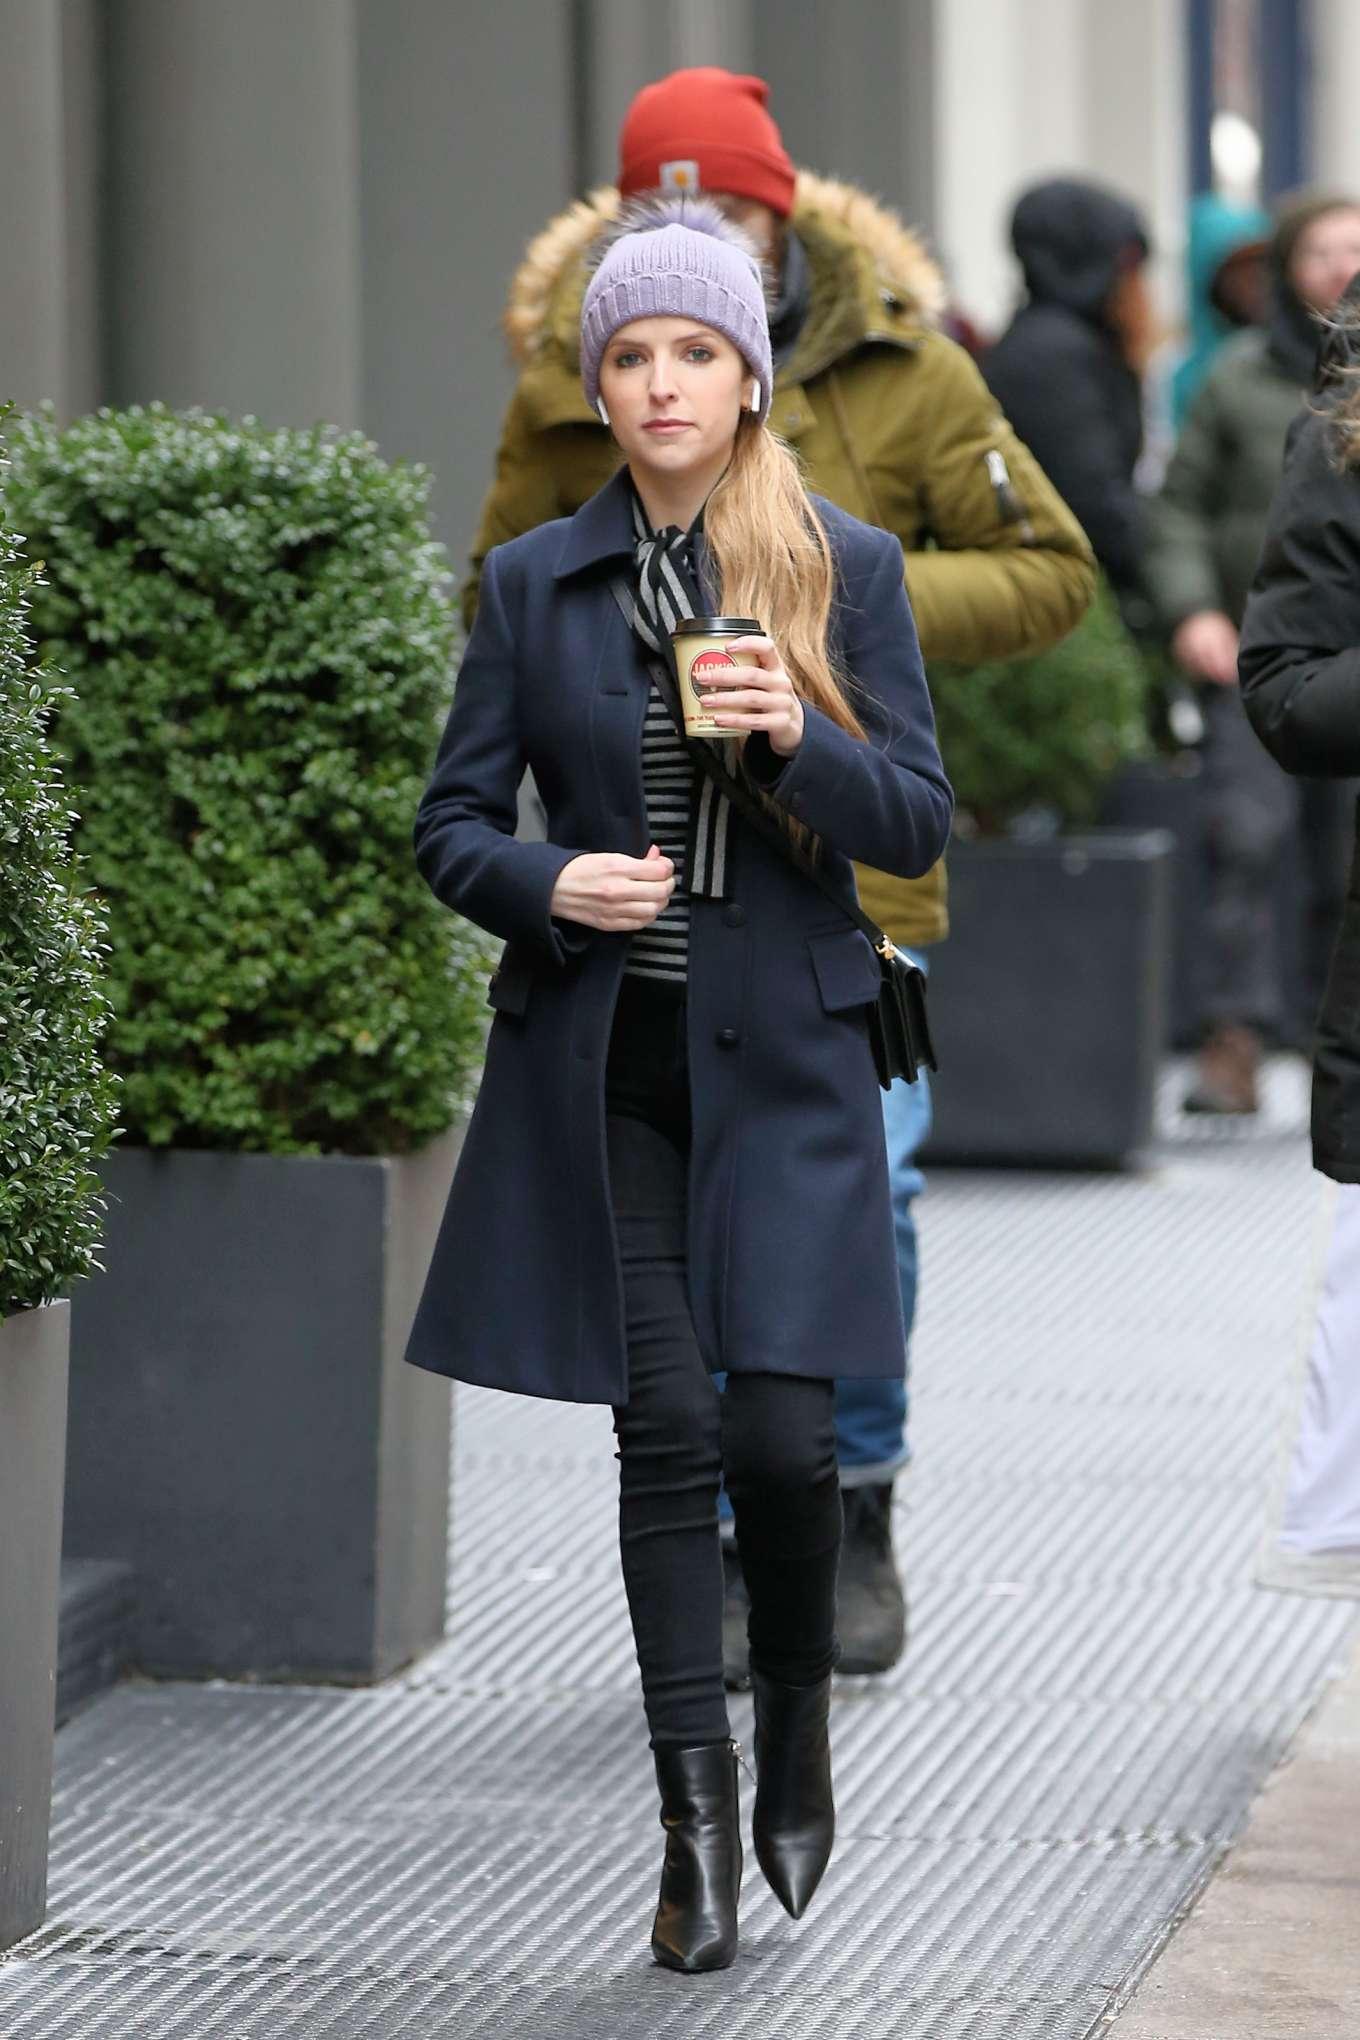 Anna Kendrick - Filming 'Love Life' Set in New York City